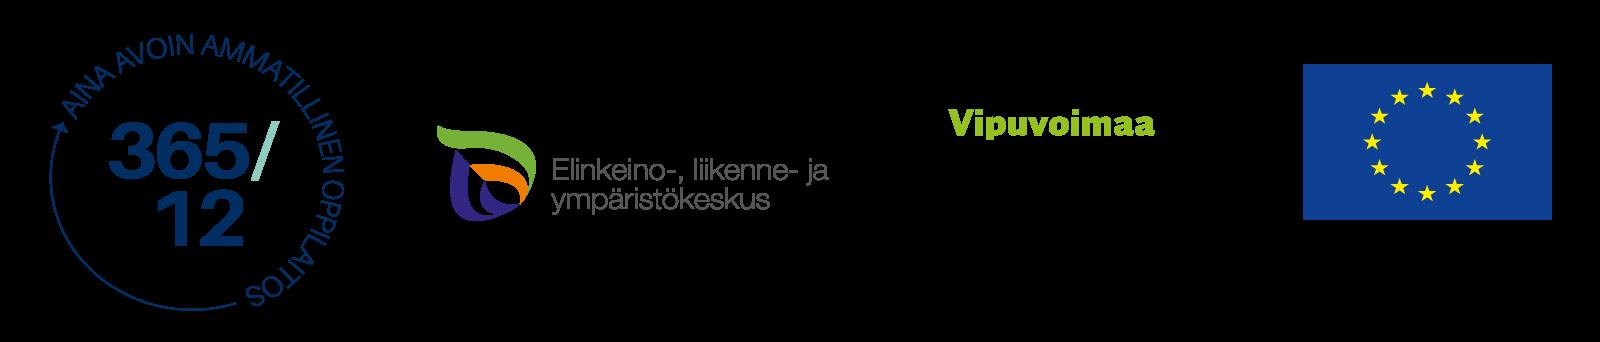 Projektin logot.